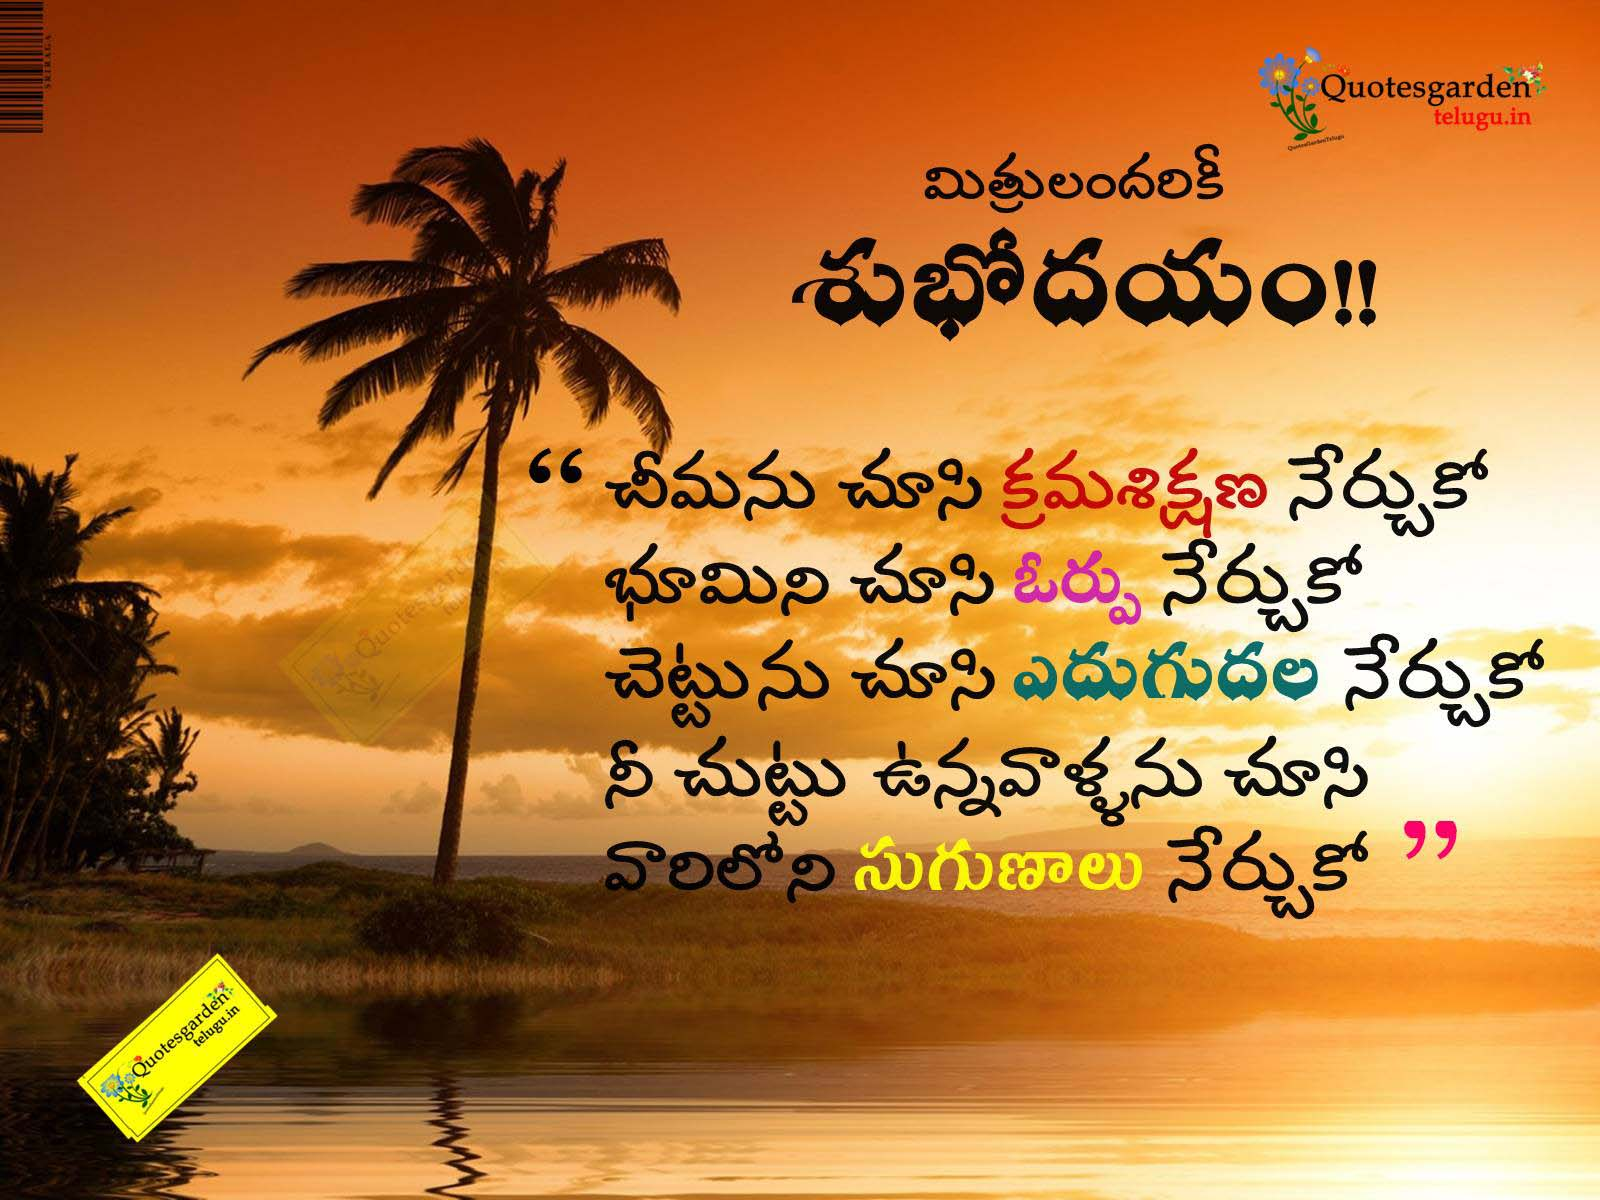 Best Quotes On Life In Telugu